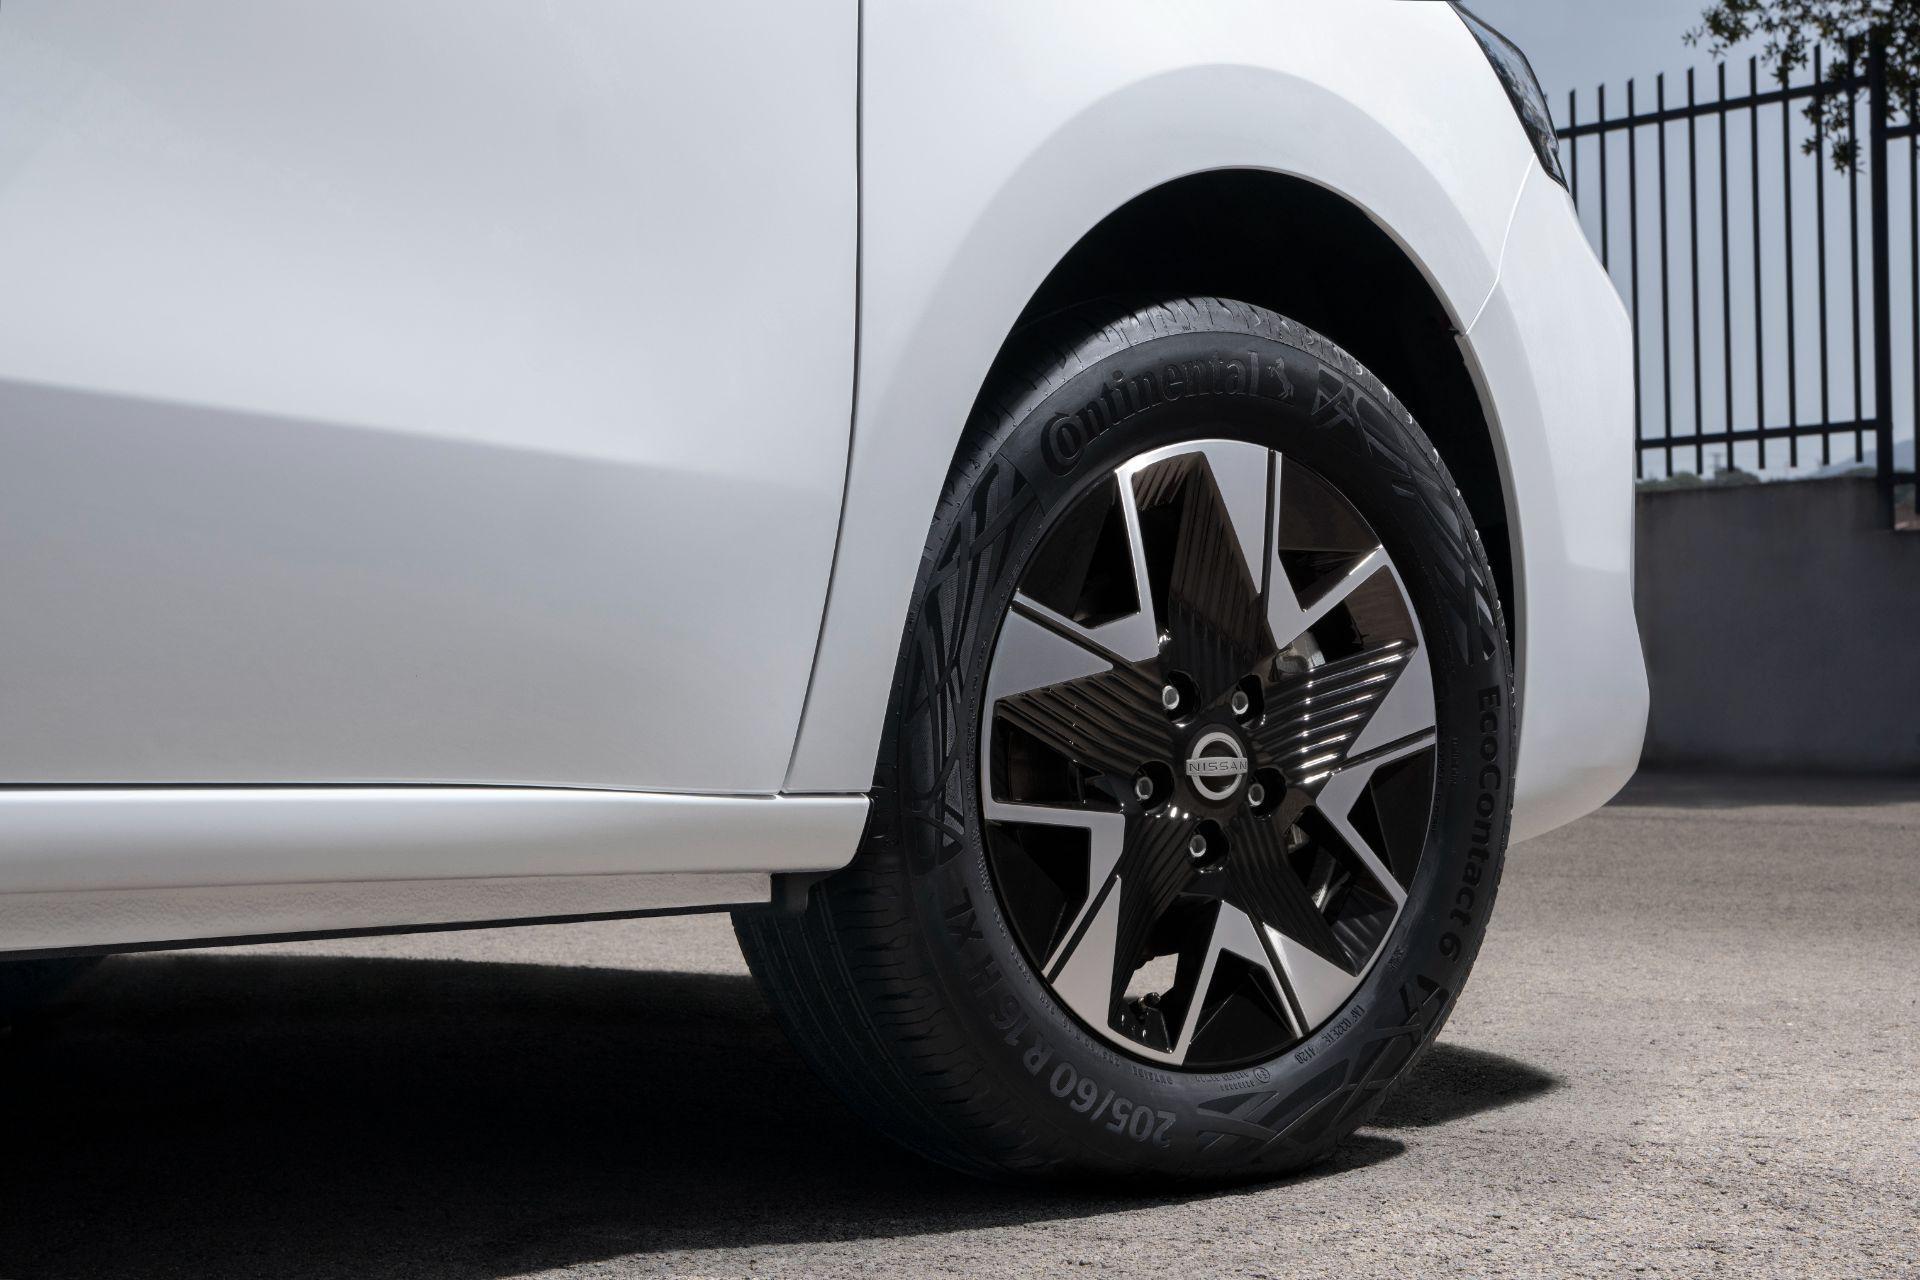 2022-Nissan-Townstar-EV-van-dynamic-11